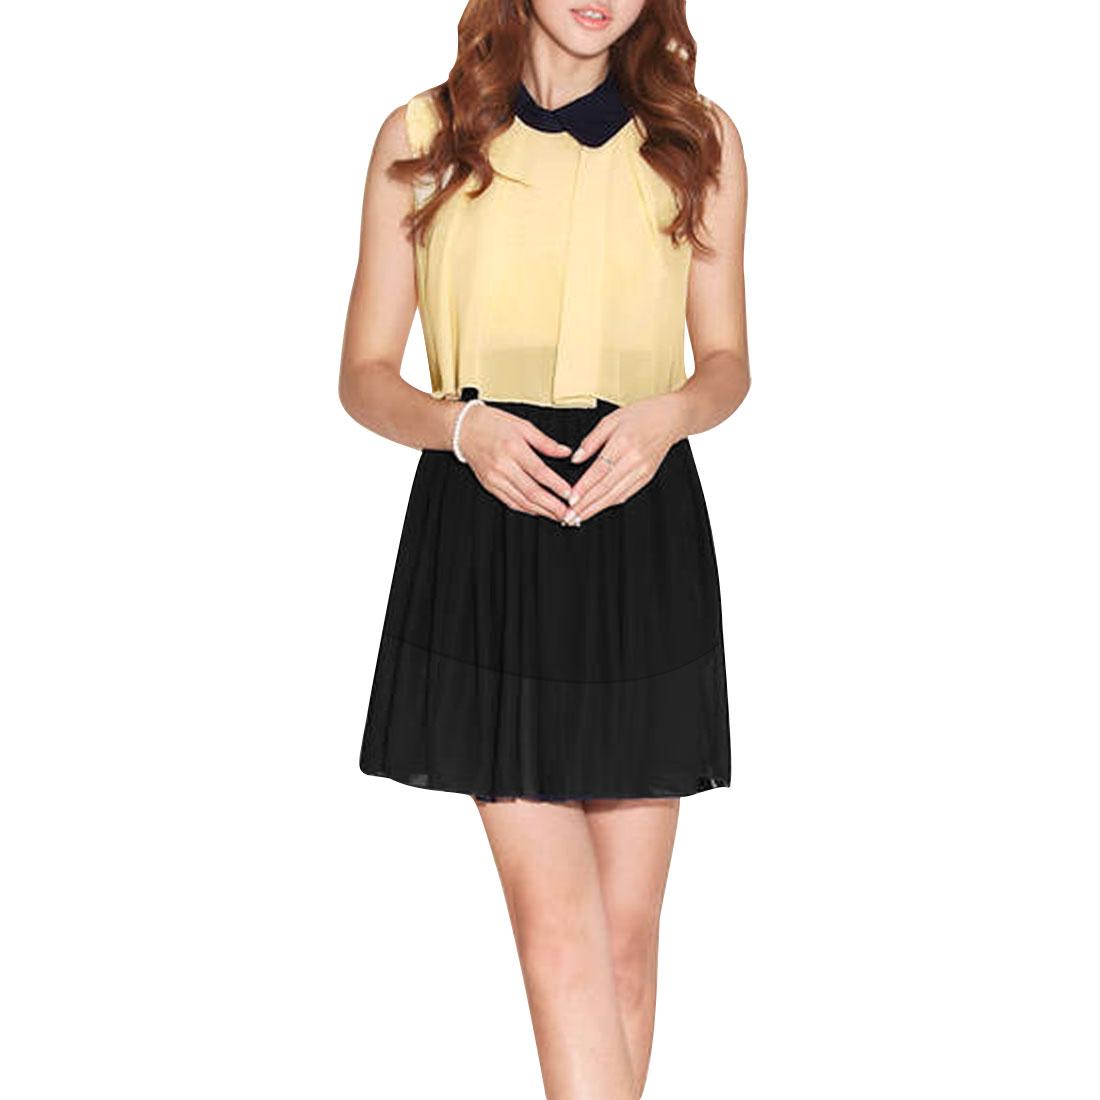 Woman Chic Contrast Color Design Splice Black Beige Mini Dress S